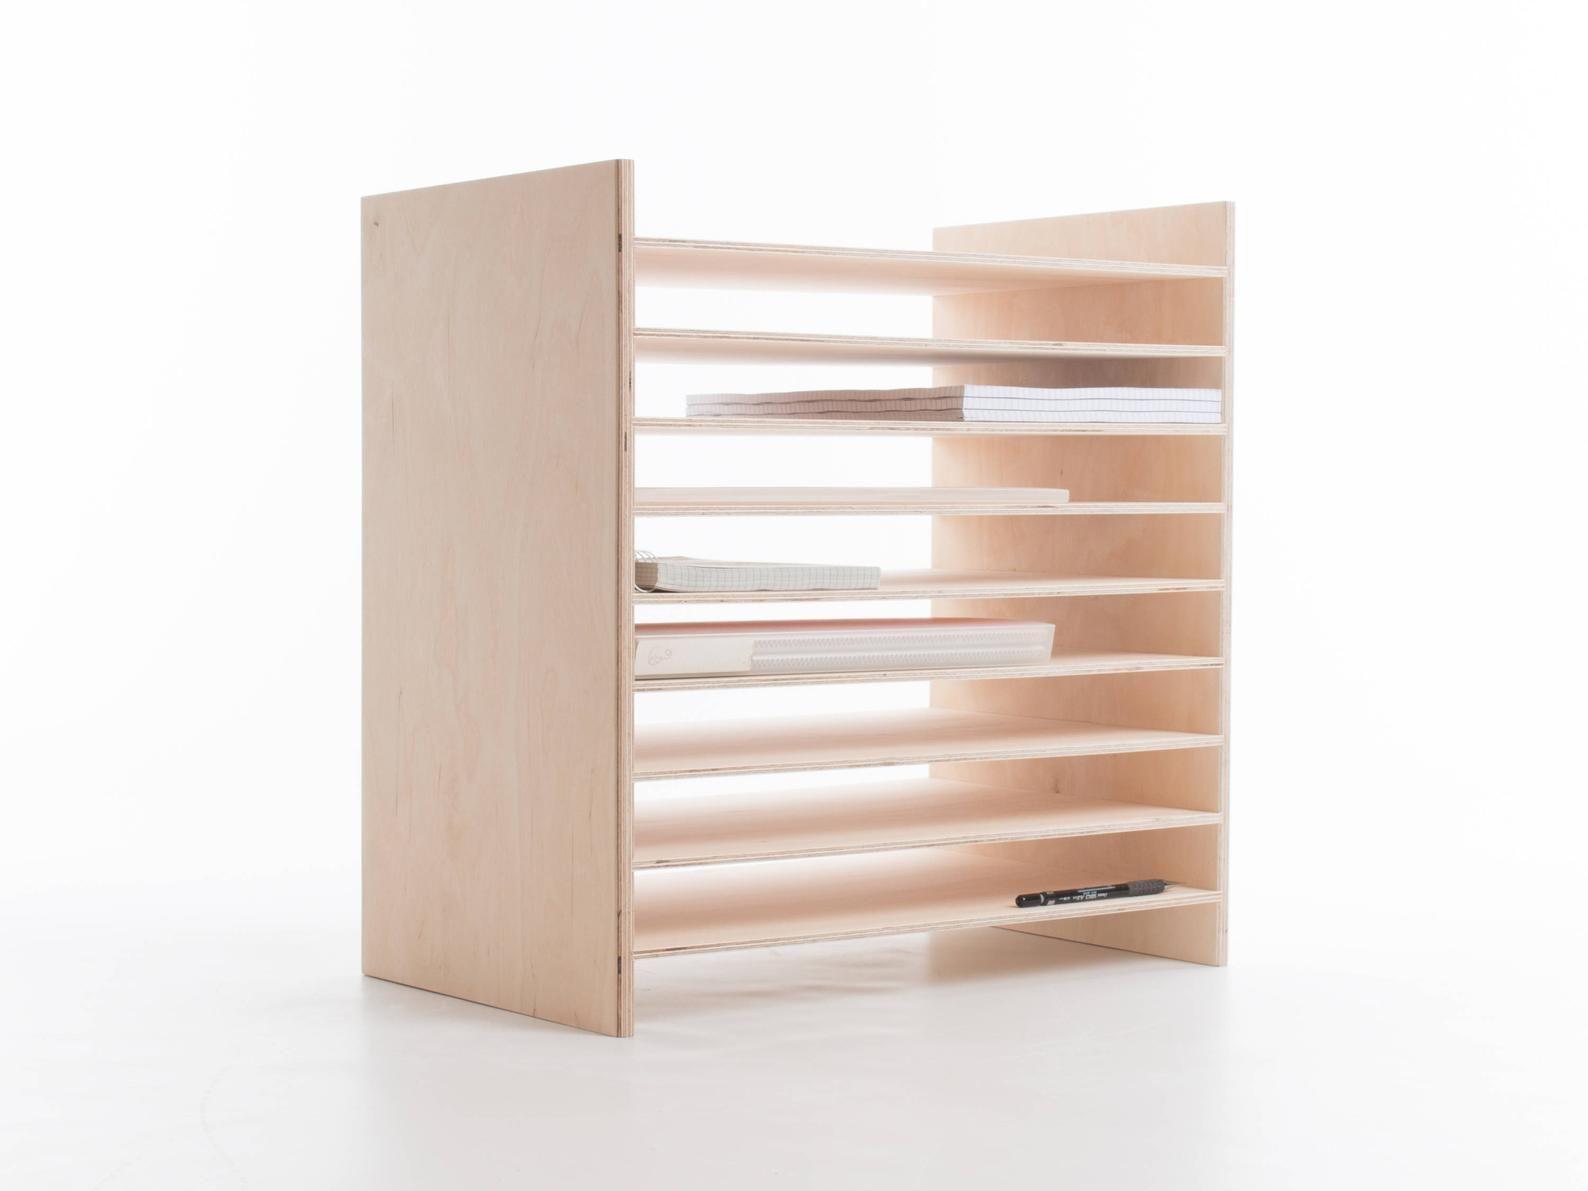 Stack A3 Paper Rack Shelves Desktop Organizer Baltic Birch Etsy Desktop Organization Rack Shelf Shelves